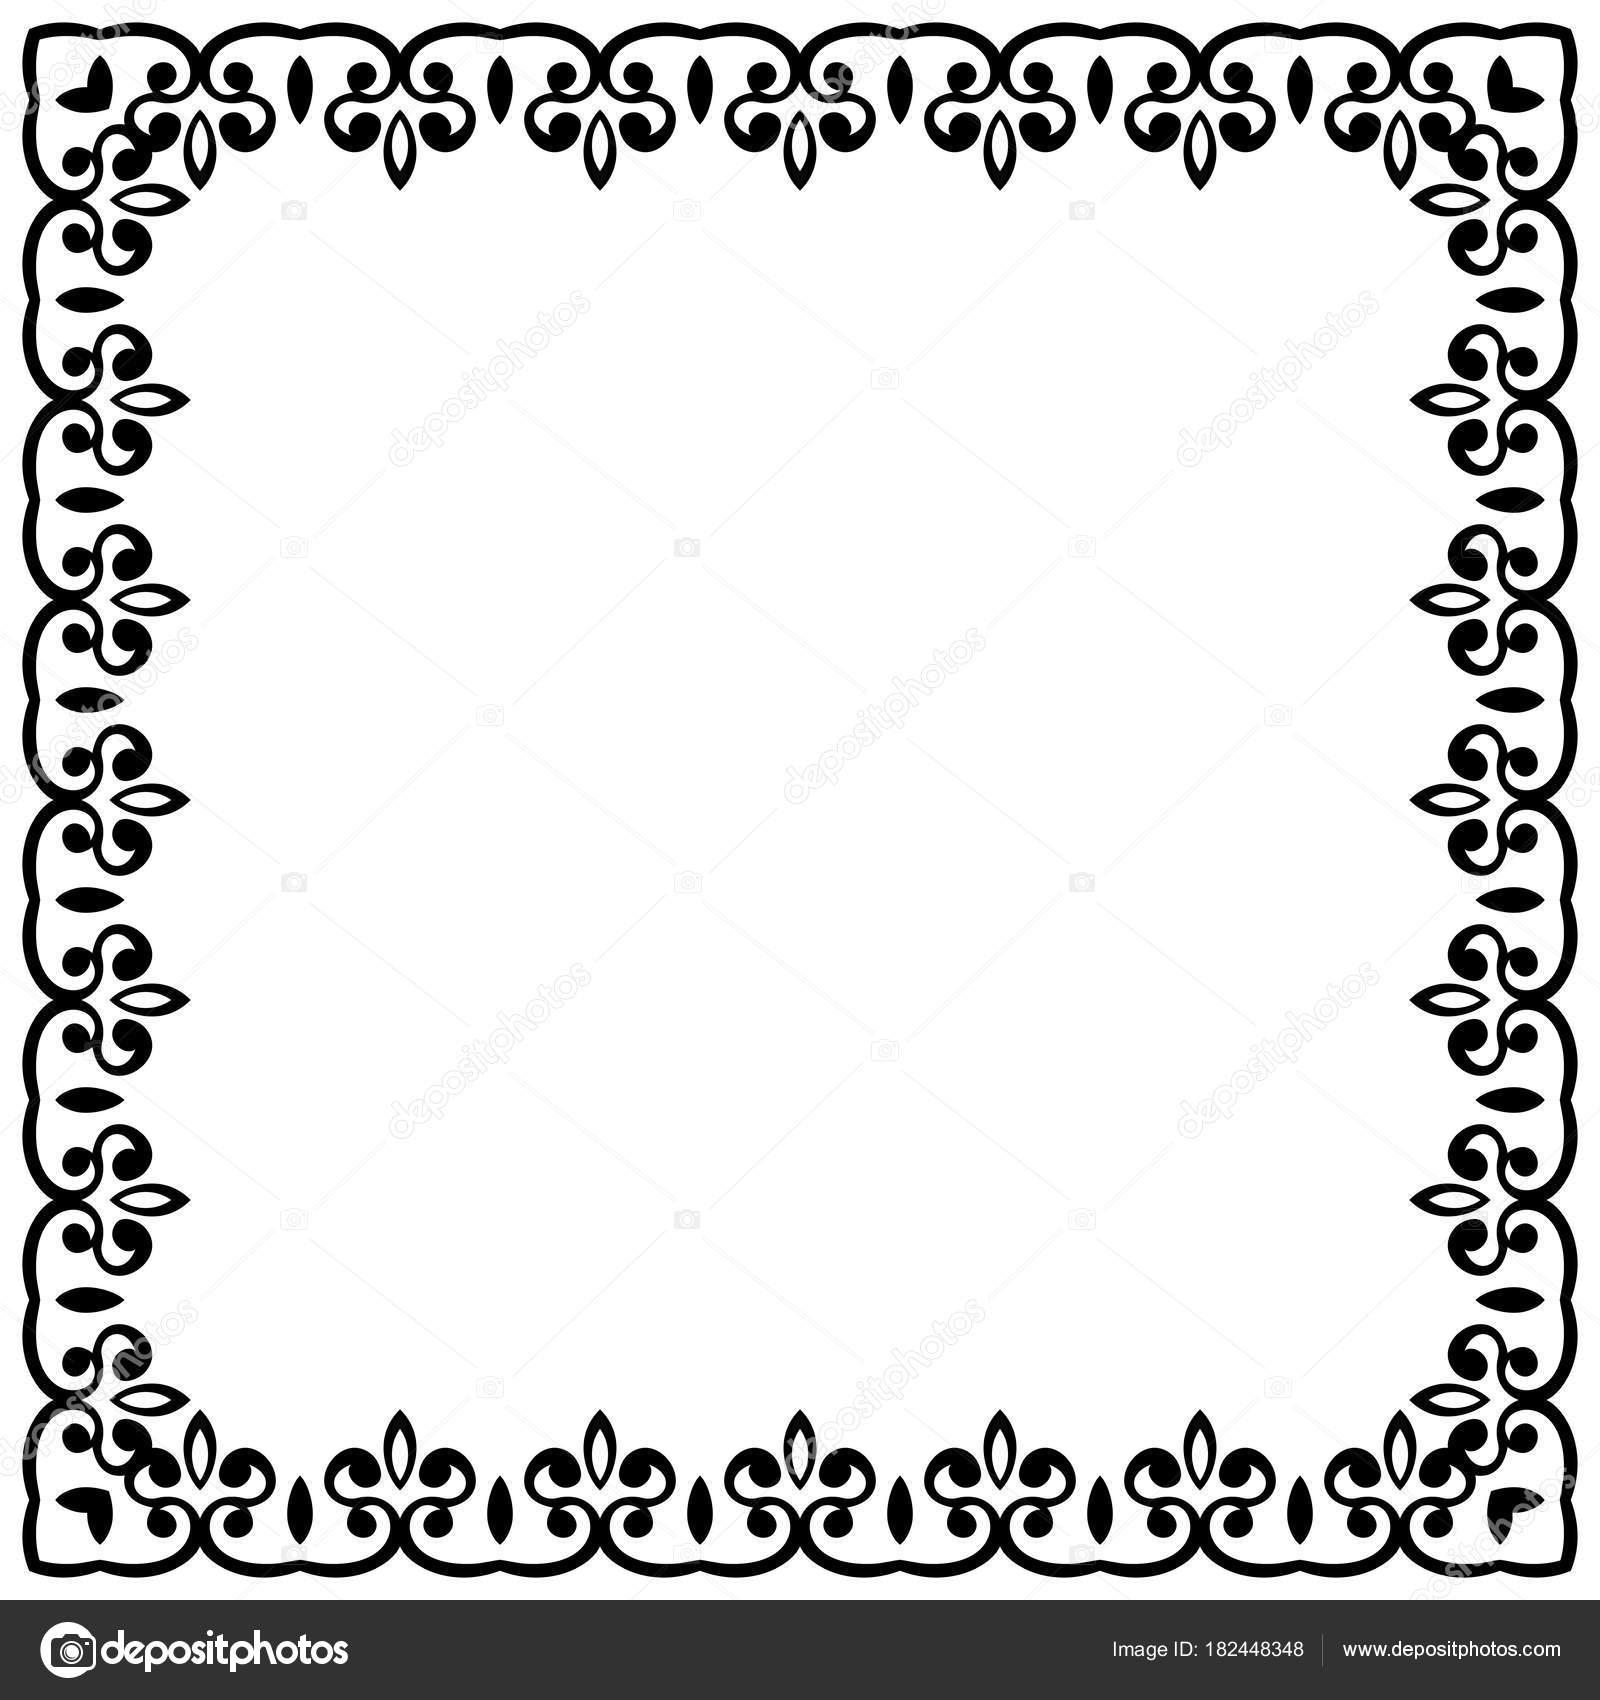 border vector vintage pattern decorative retro frame stock vector rh depositphotos com decorative border vector art decorative border vector free download